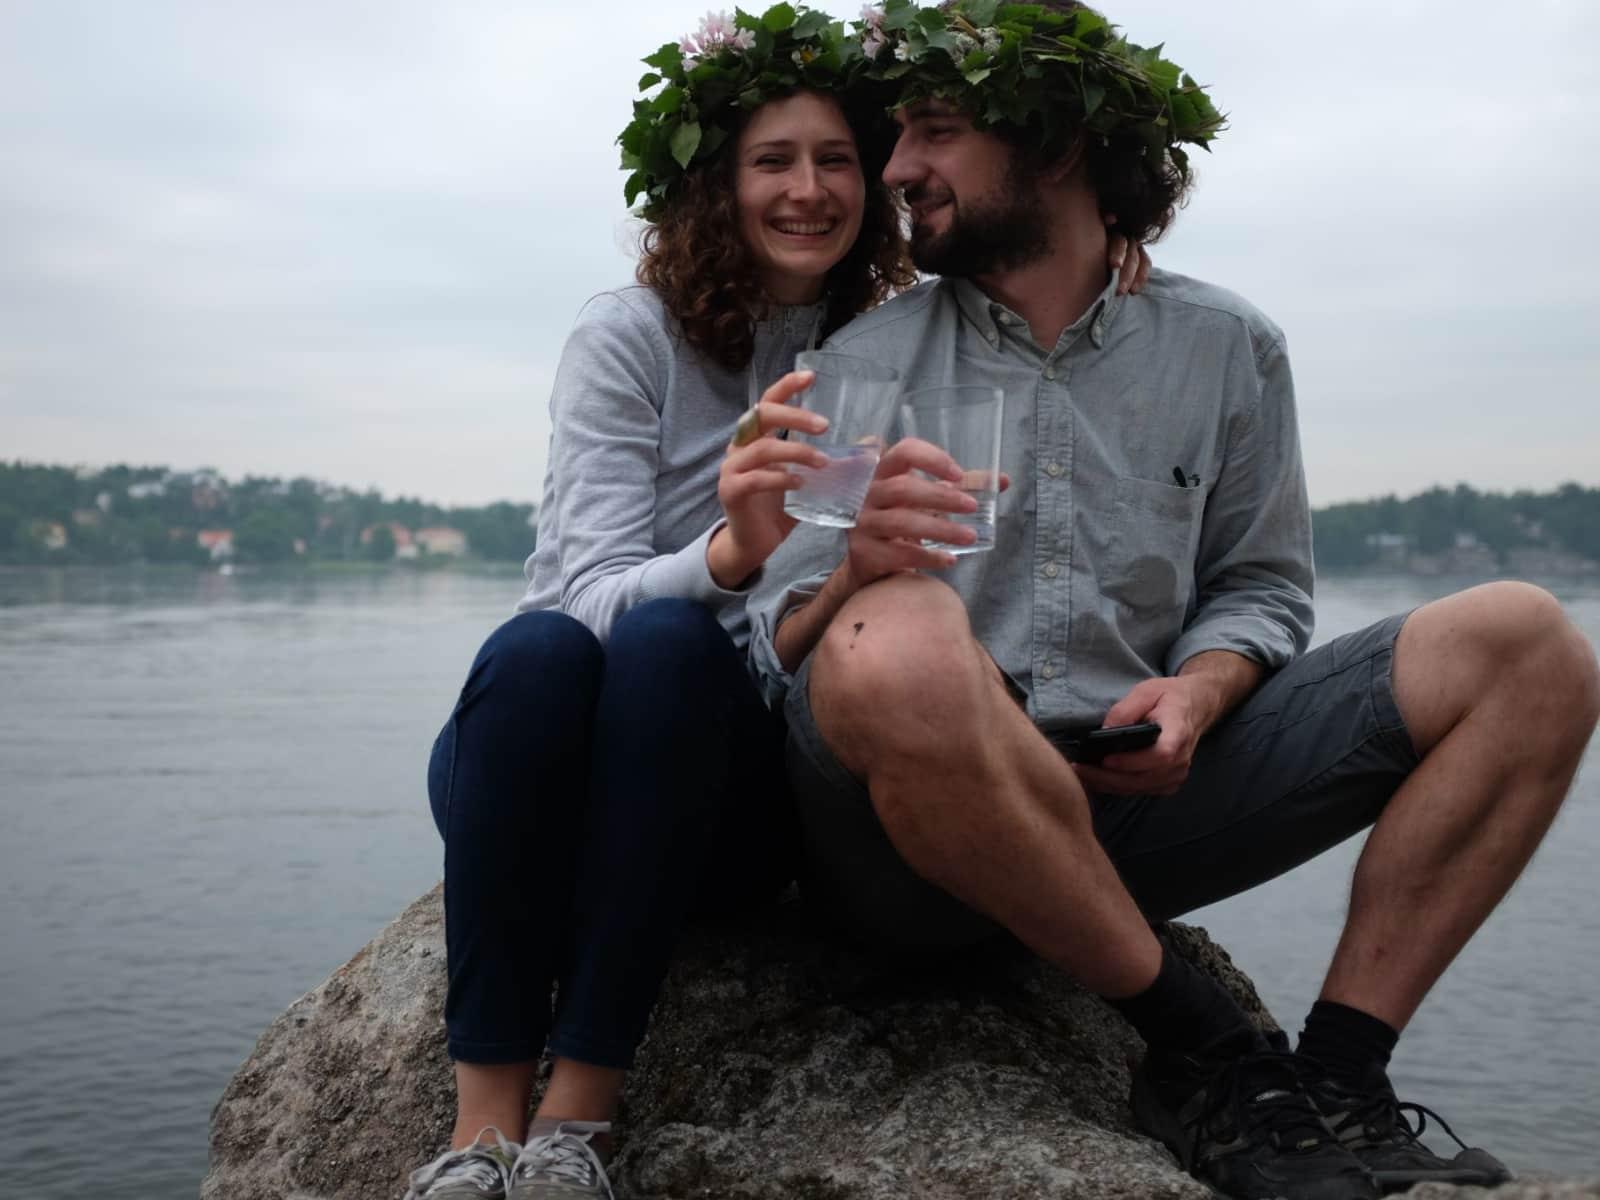 Jela & Hrvoje from Velika Gorica, Croatia